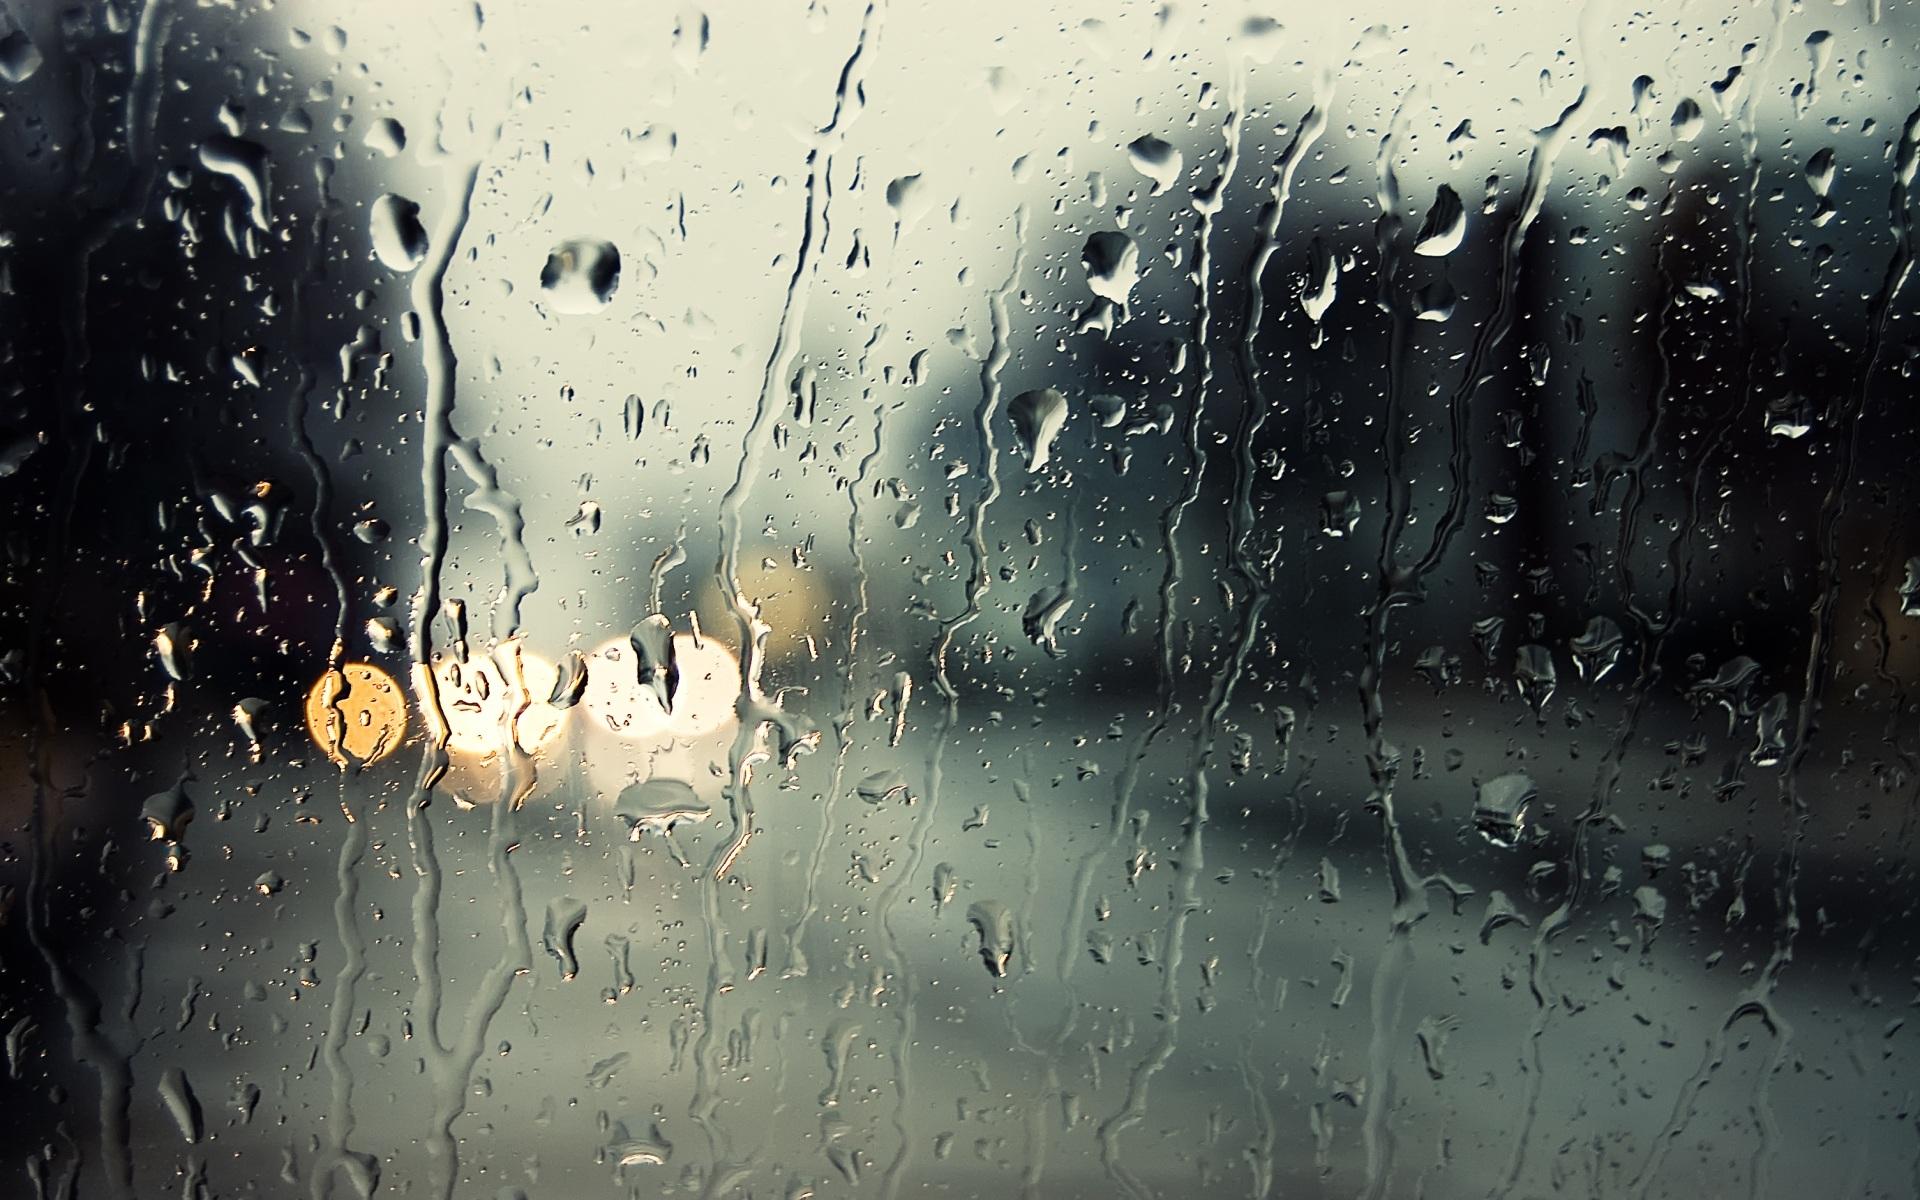 Rainy Day HD Wallpaper Theme Bin   Customization HD Wallpapers 1920x1200